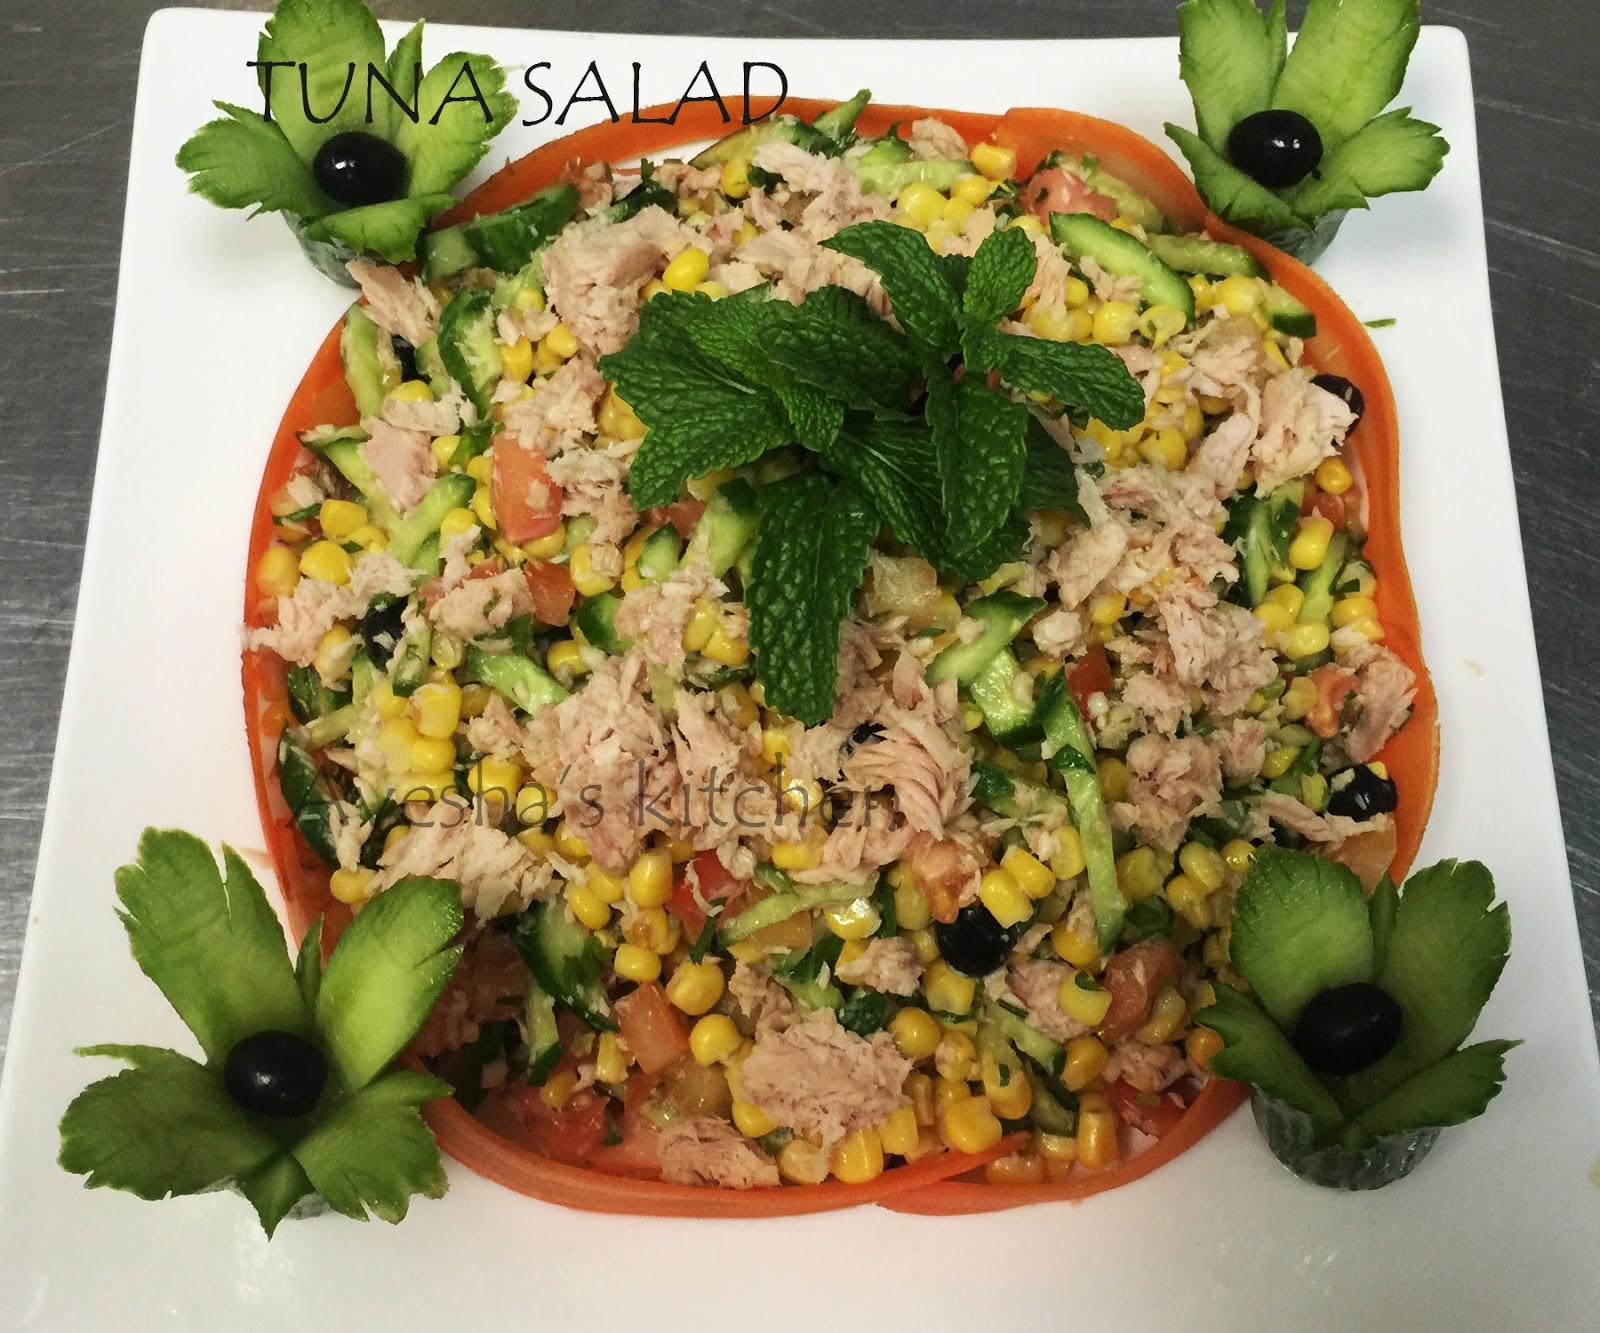 Salad recipes tuna salad healthy salad recipes for Tuna fish salad recipe